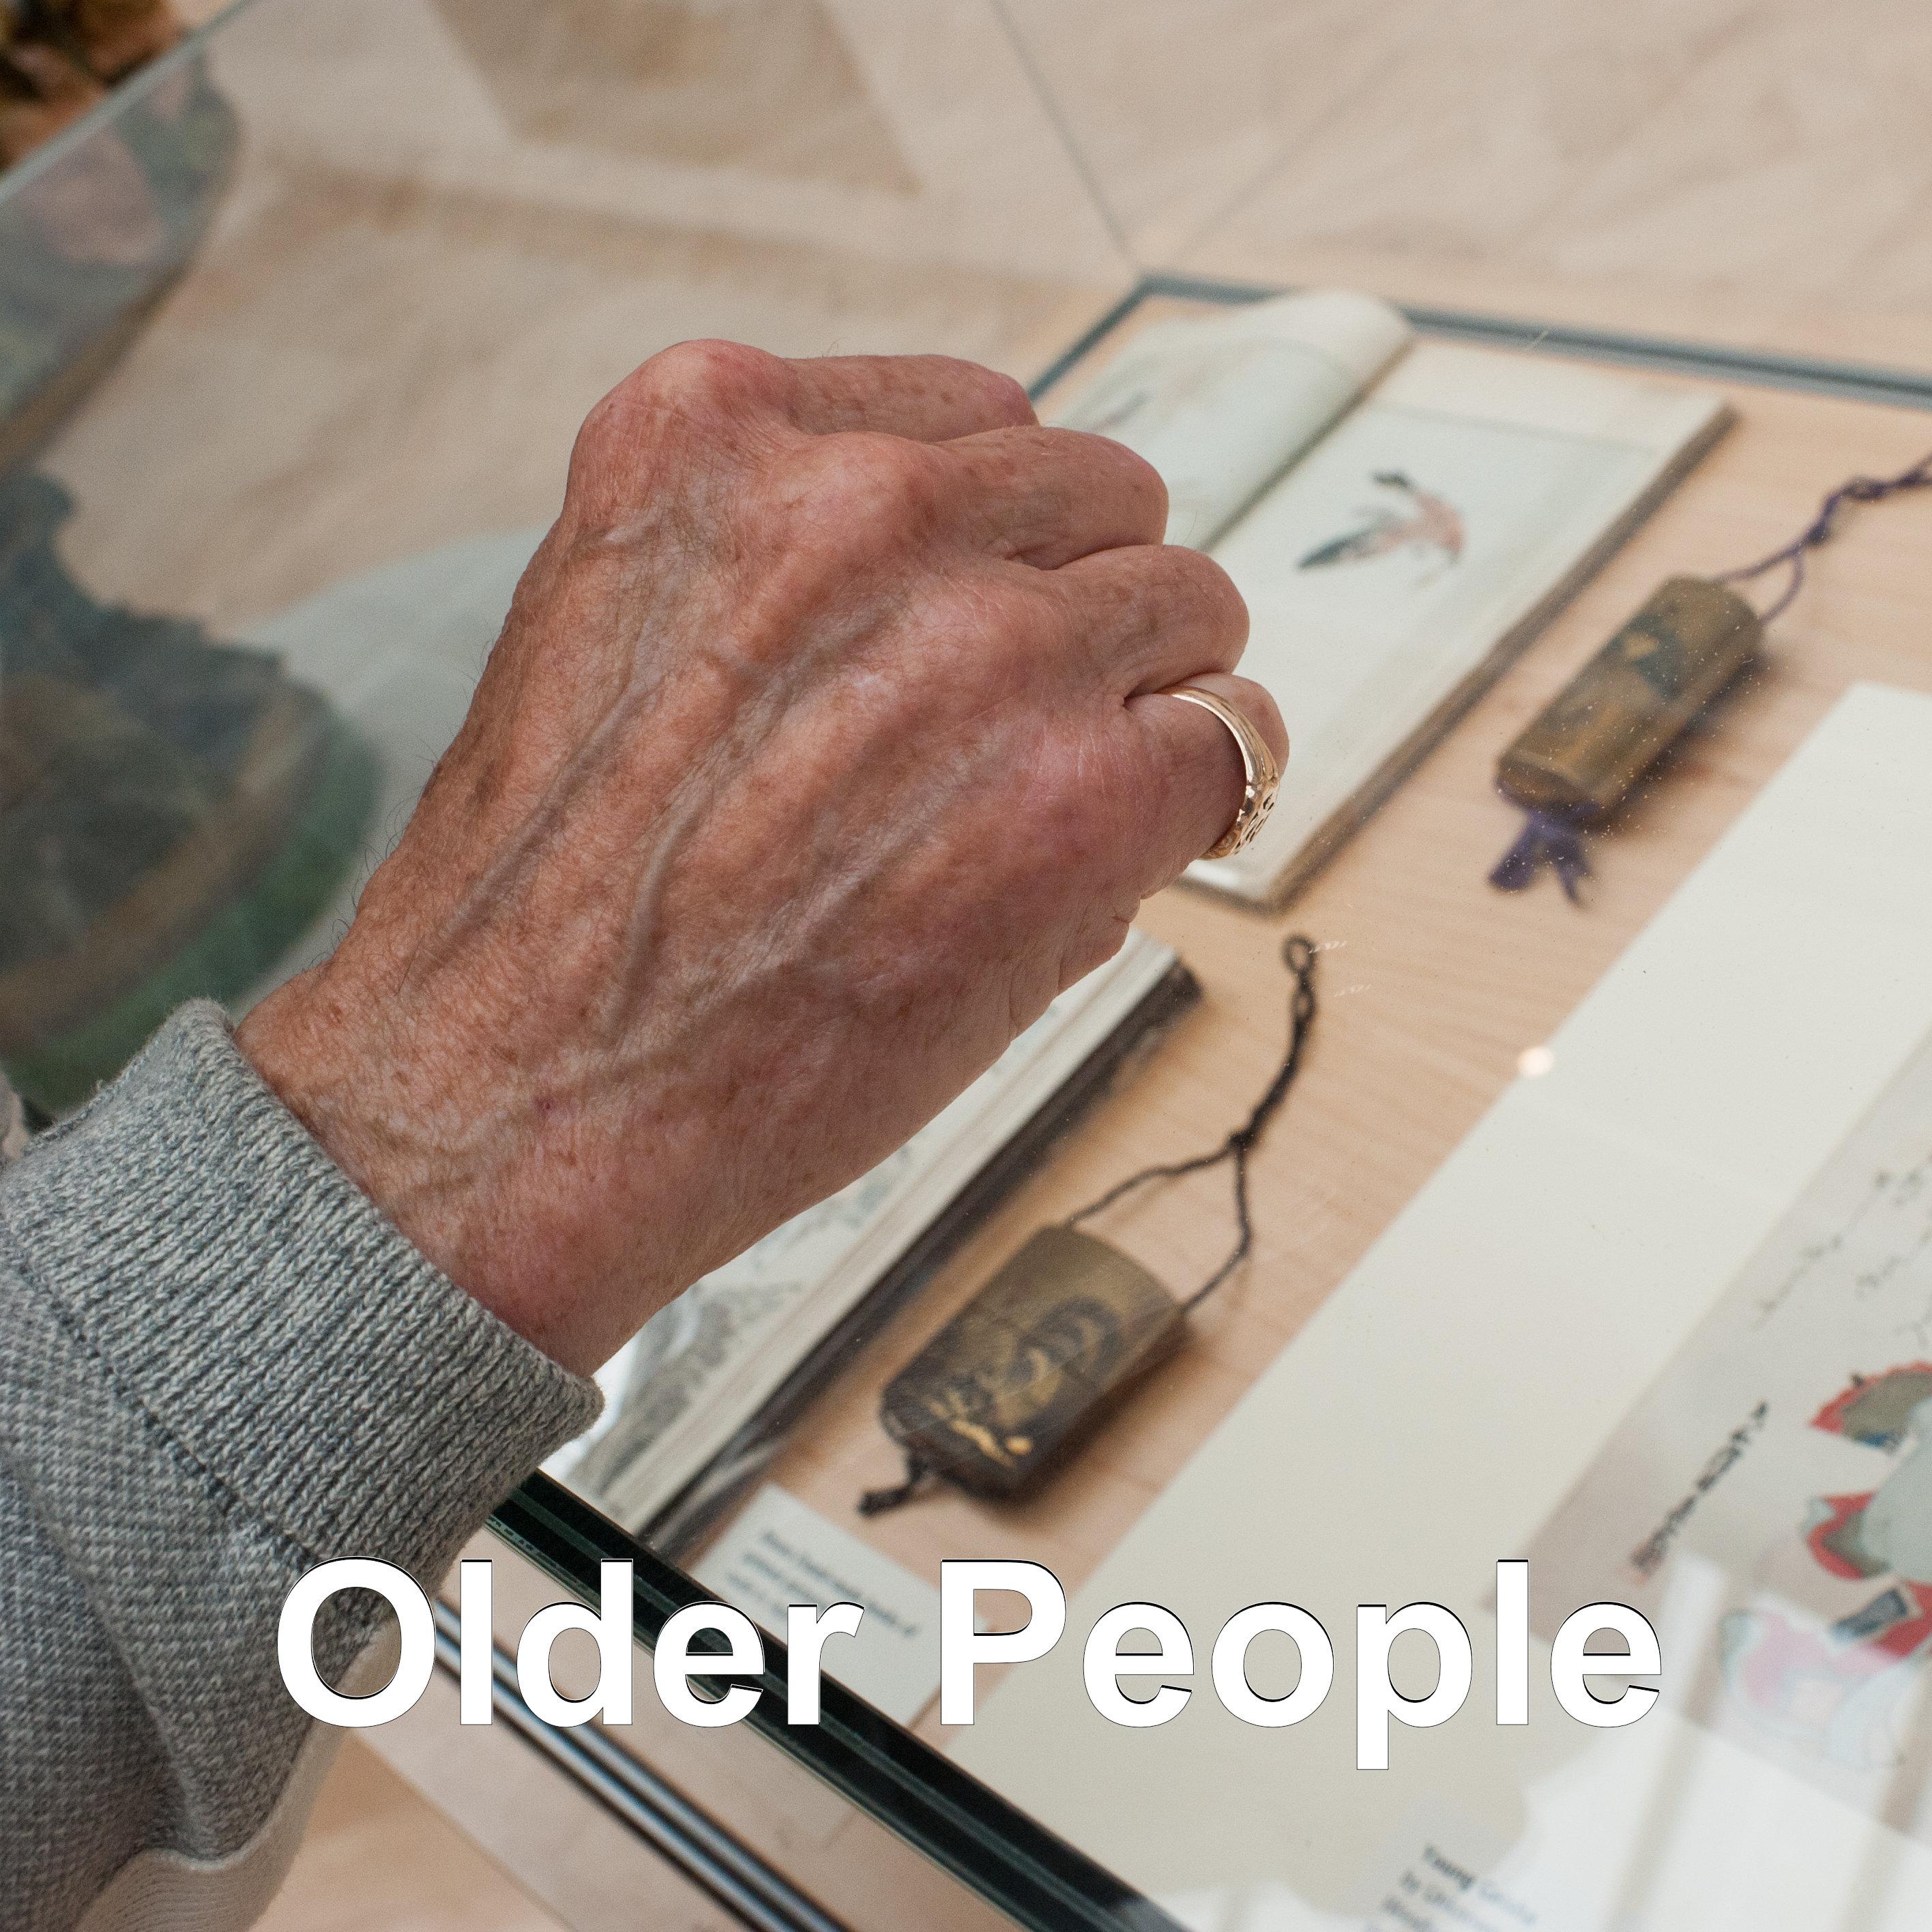 Older People box